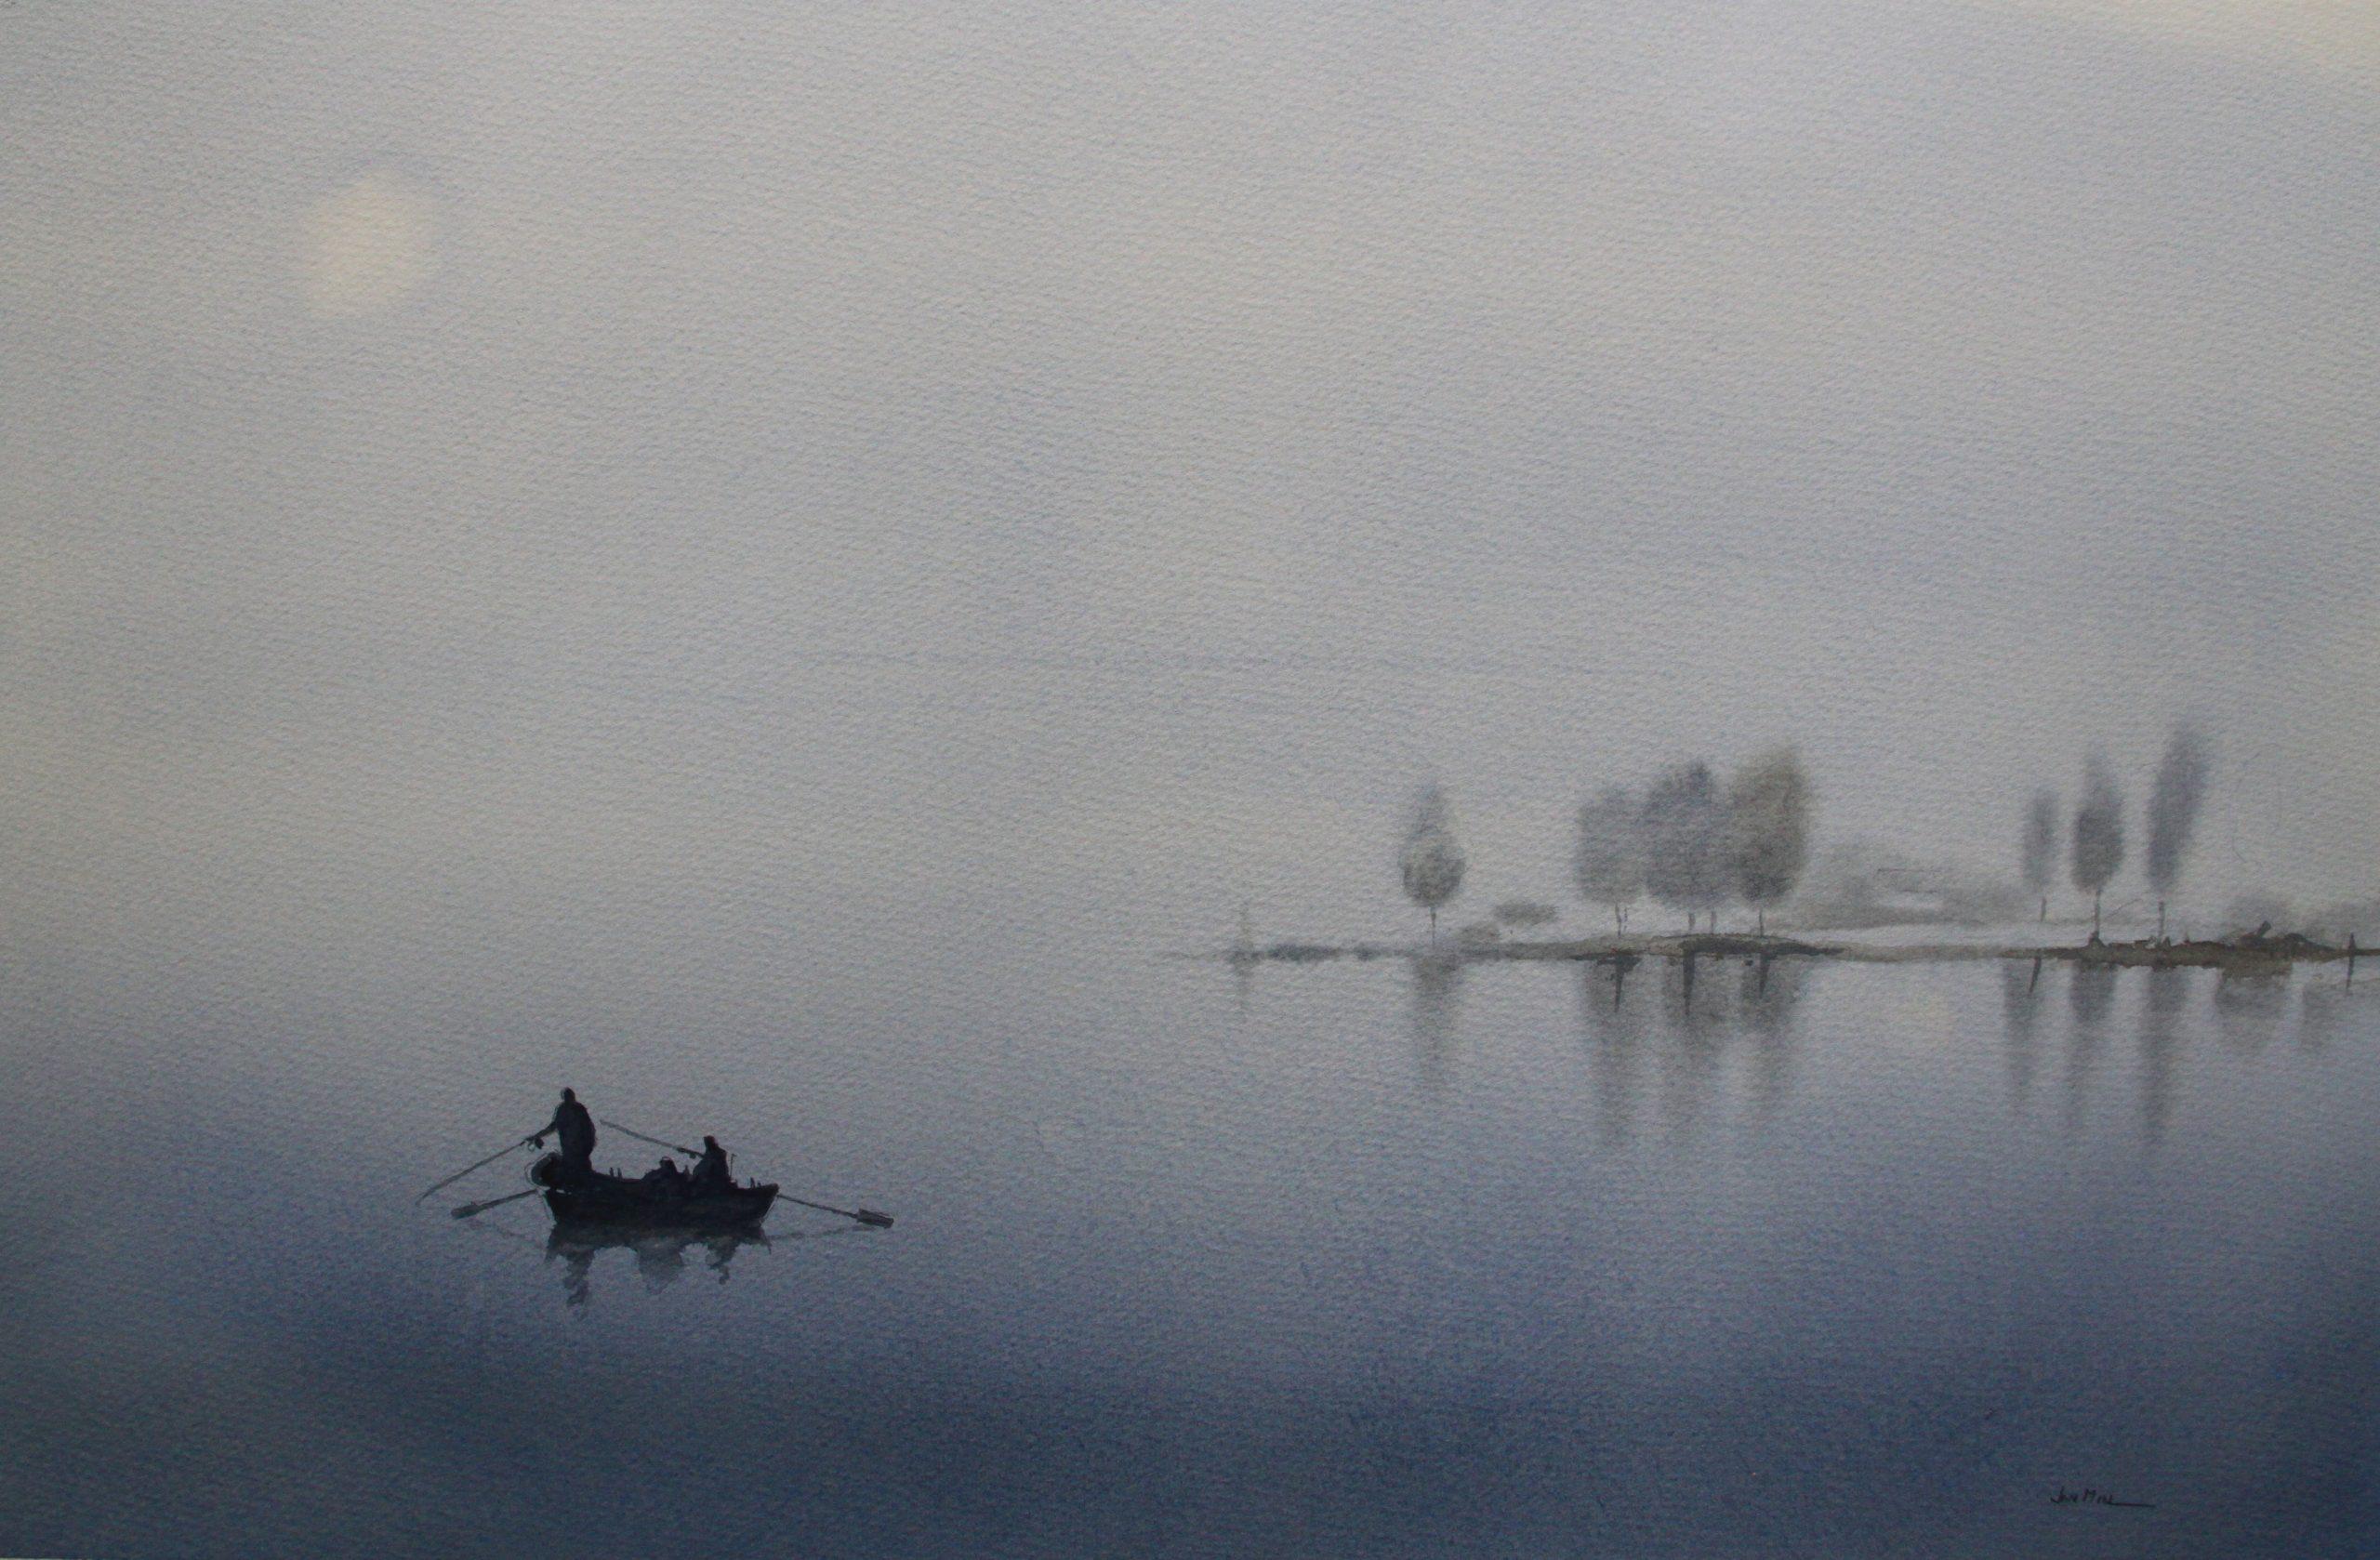 Misty fishing 3